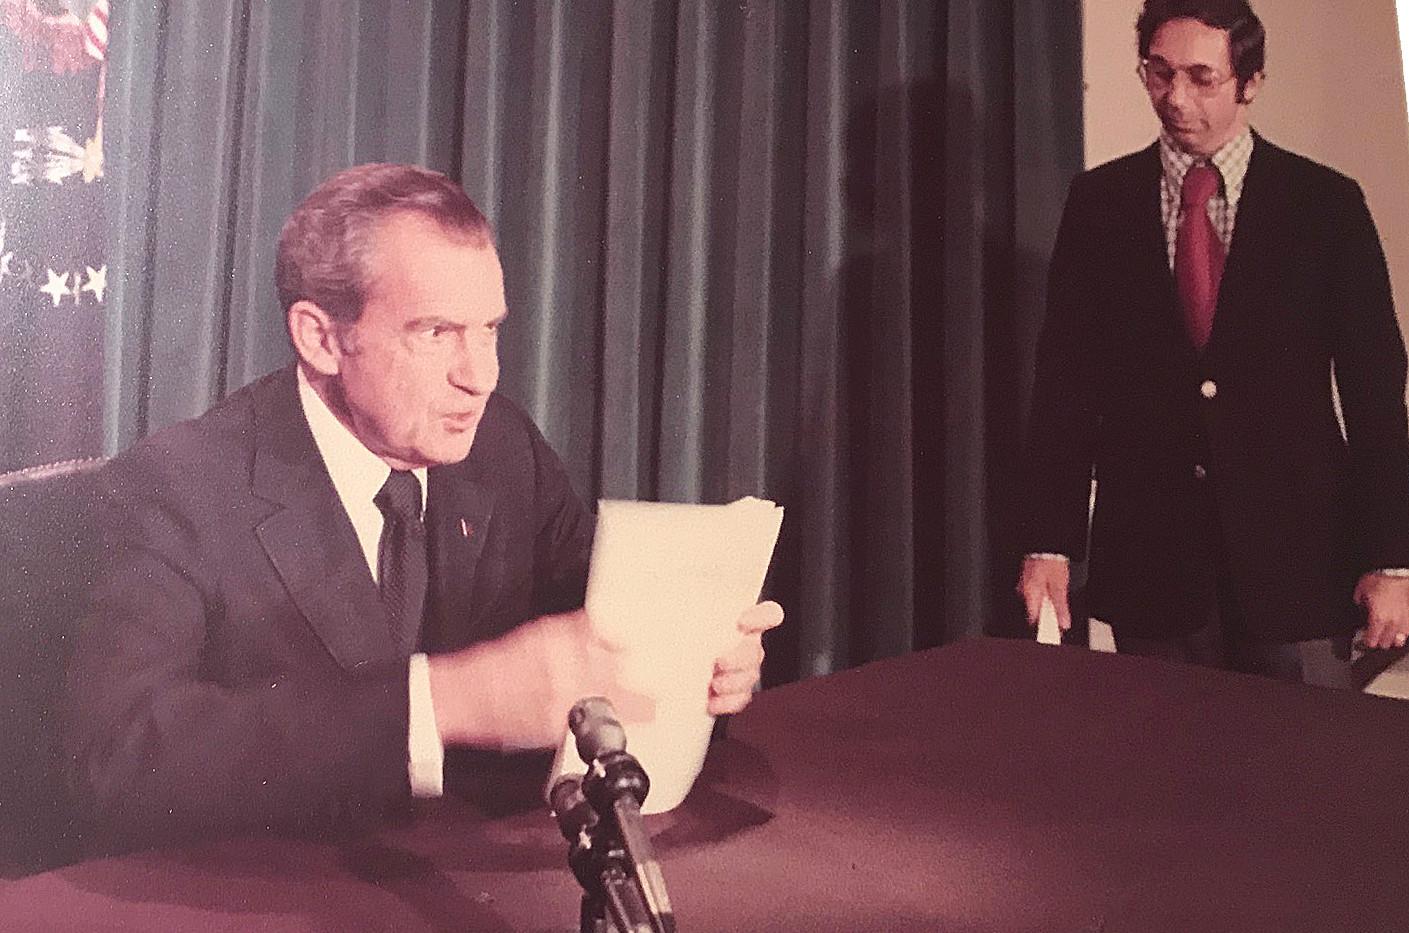 Richard Nixon resigns following the Watergate Scandal